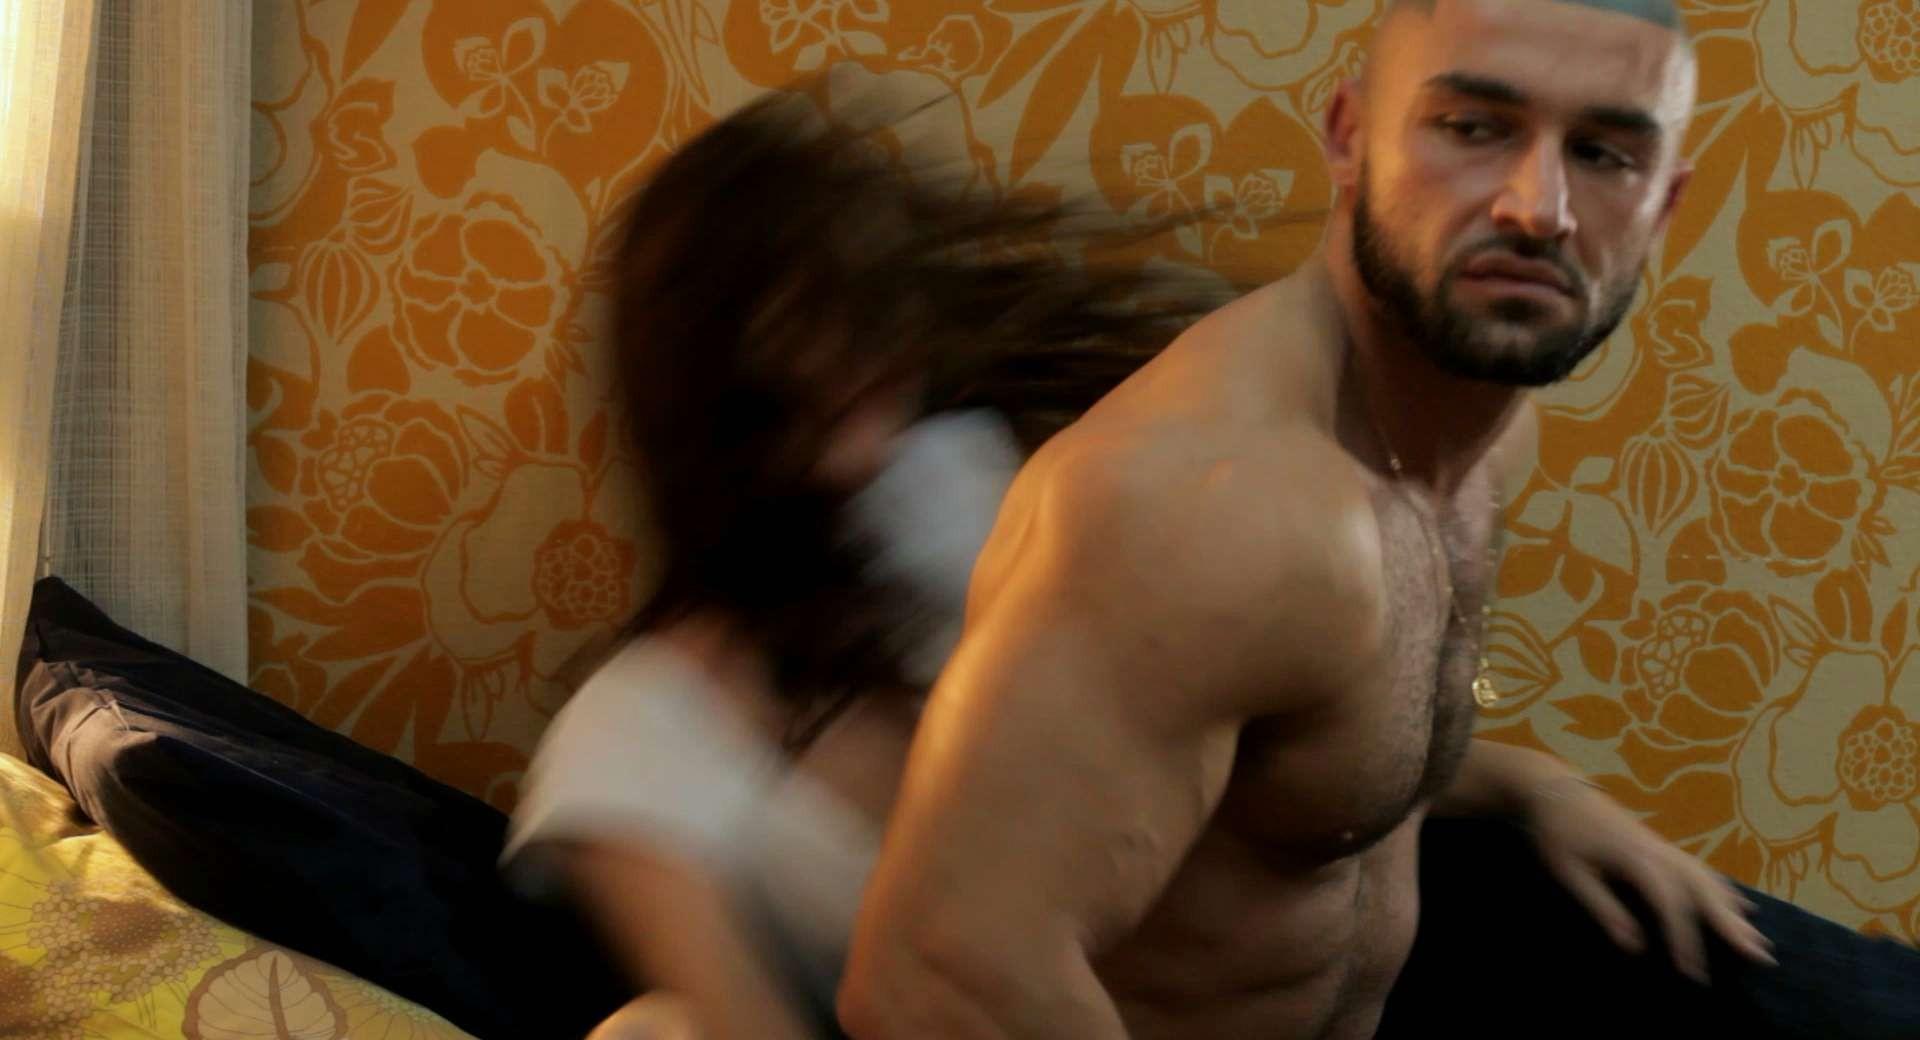 Wallpaper: François Sagat in una scena di Homme au bain (2010)